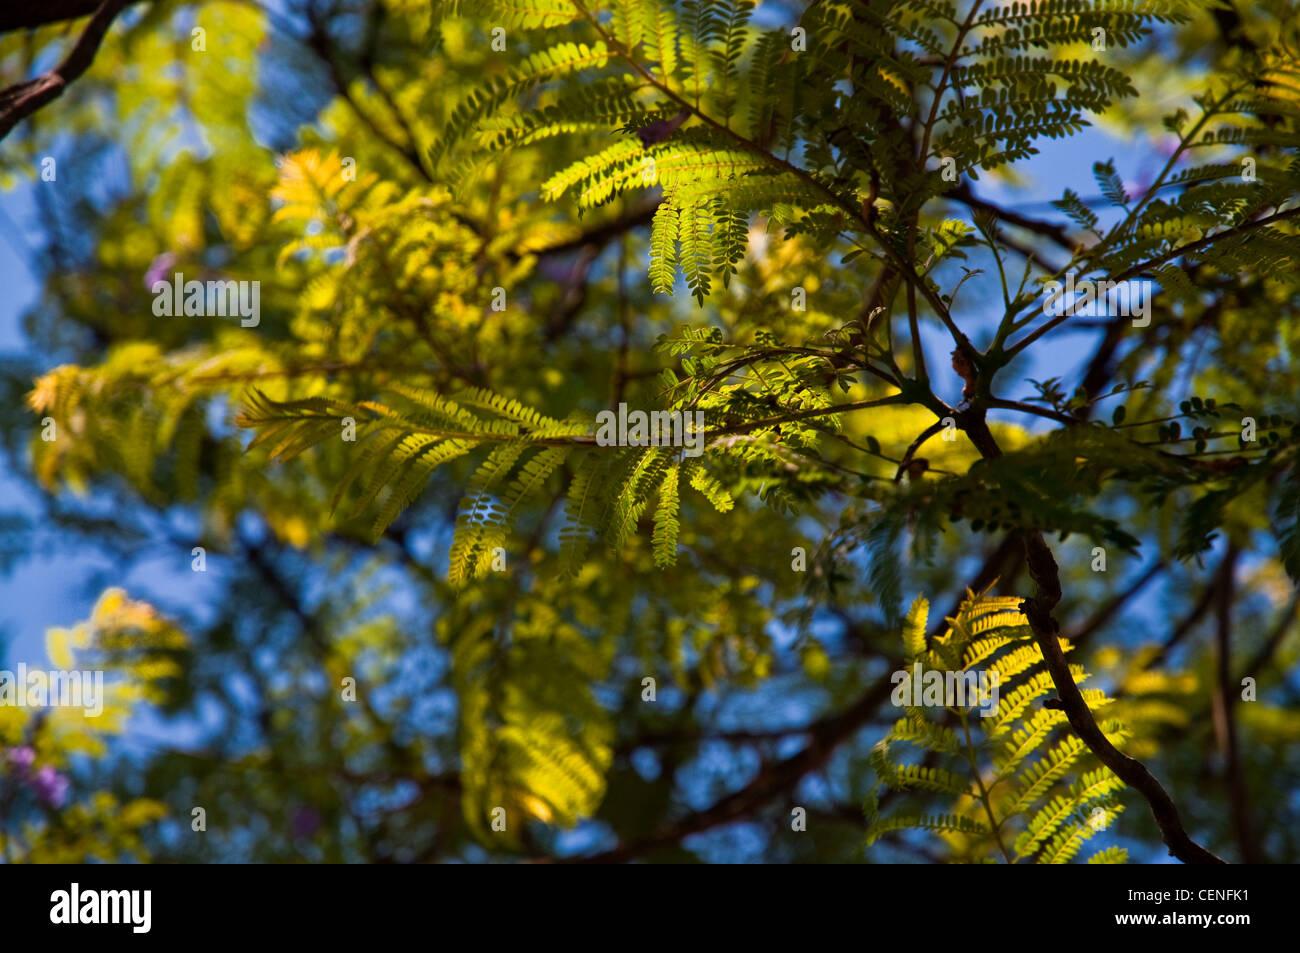 Close Up Of A Jacaranda Tree And Leaves Stock Photo Alamy